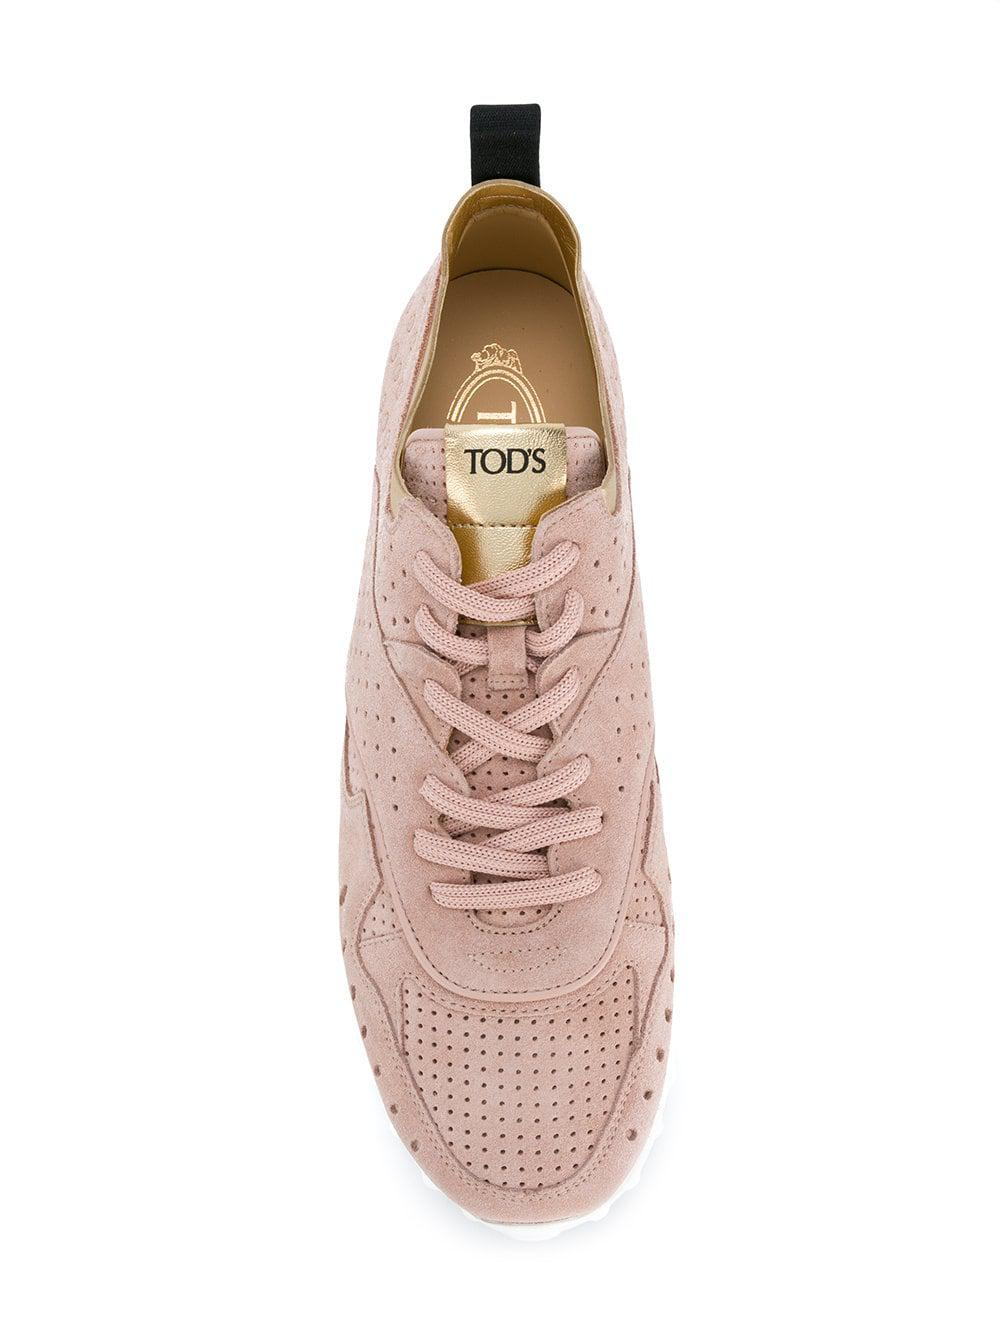 Tod's Suede Low-top Sneakers in Pink